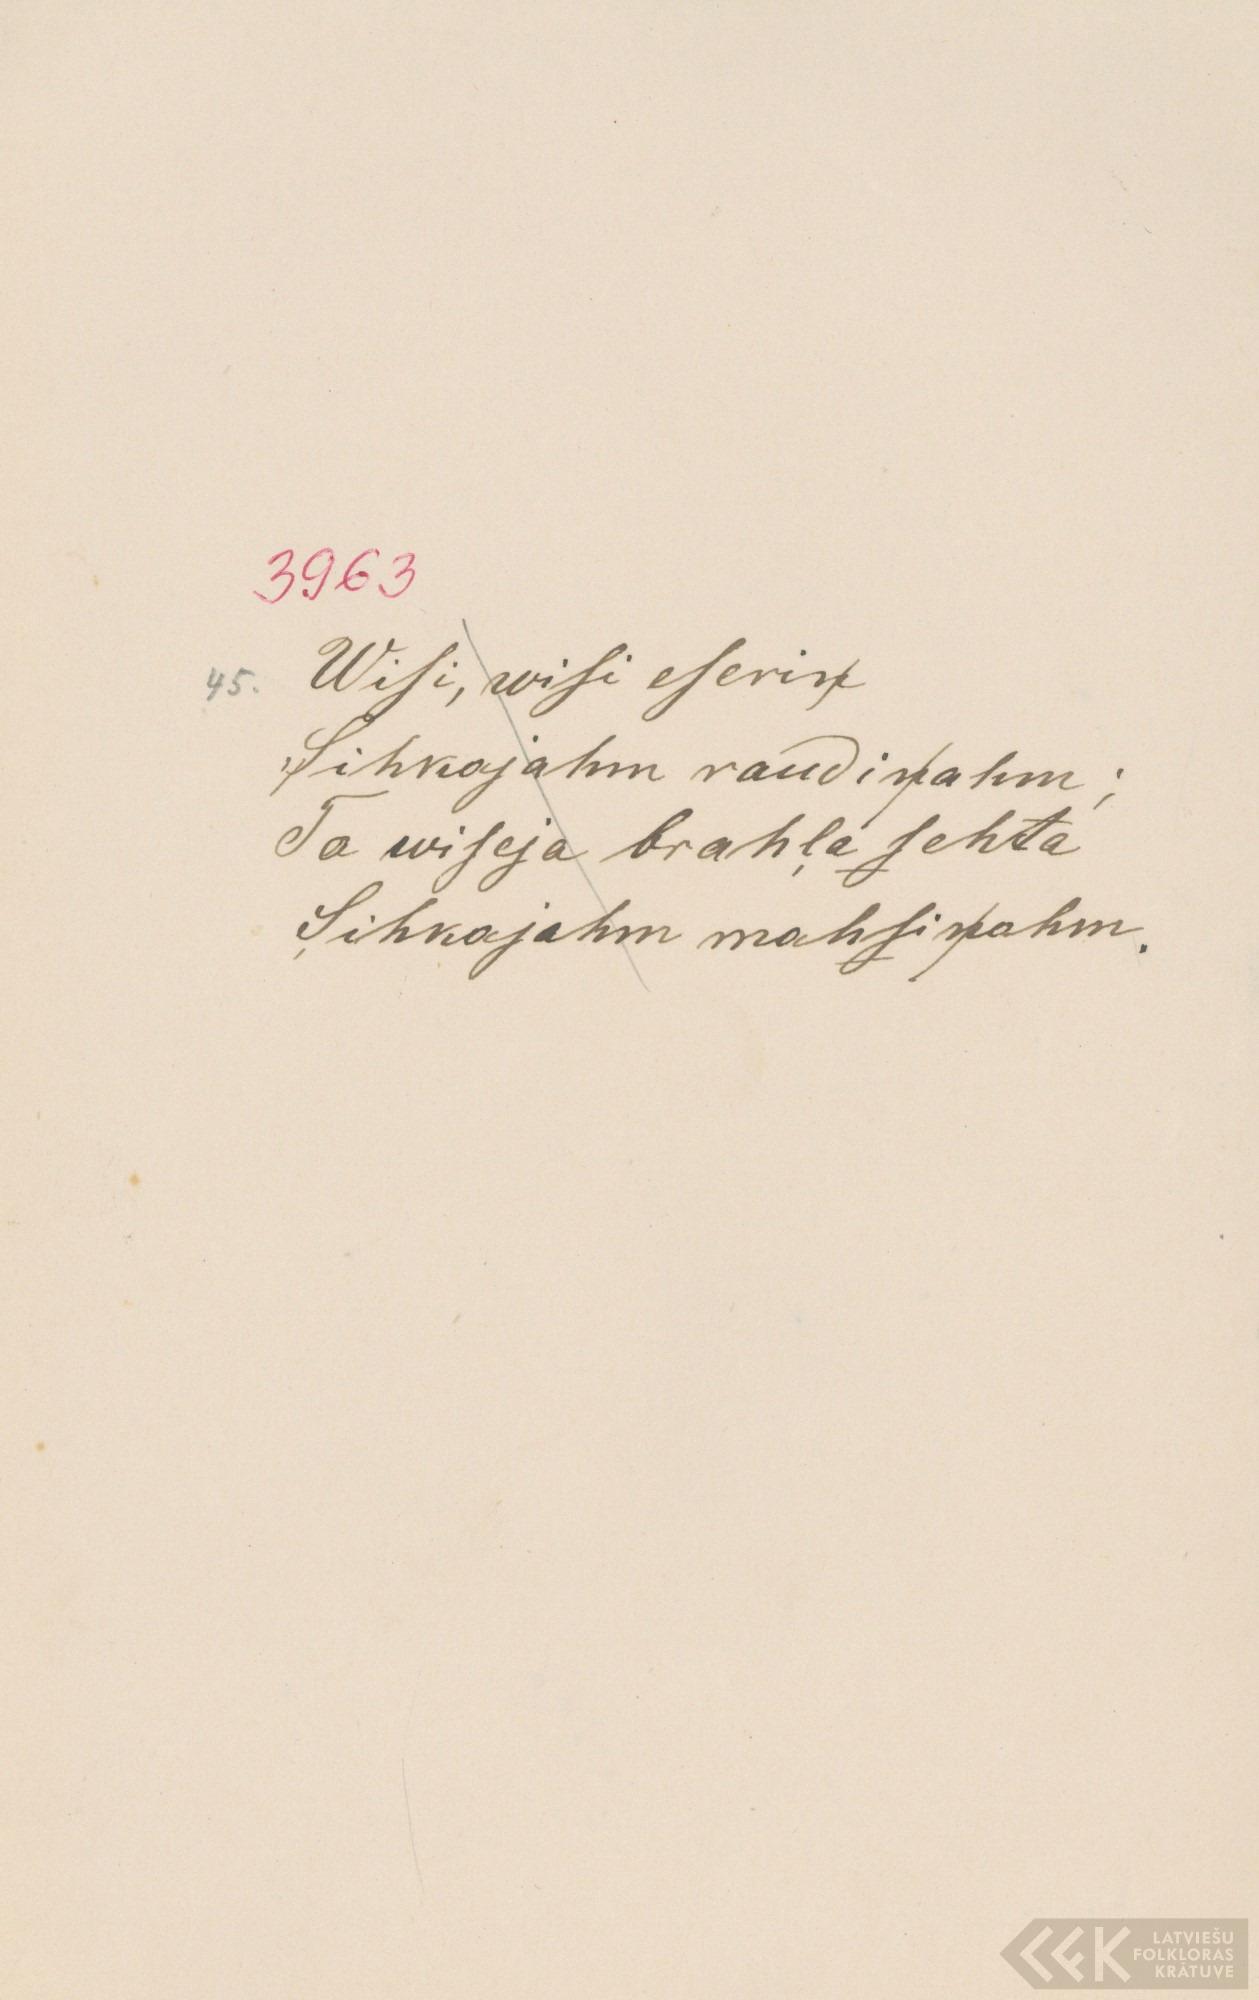 1620-Krisjana-Barona-krajums-07-0181